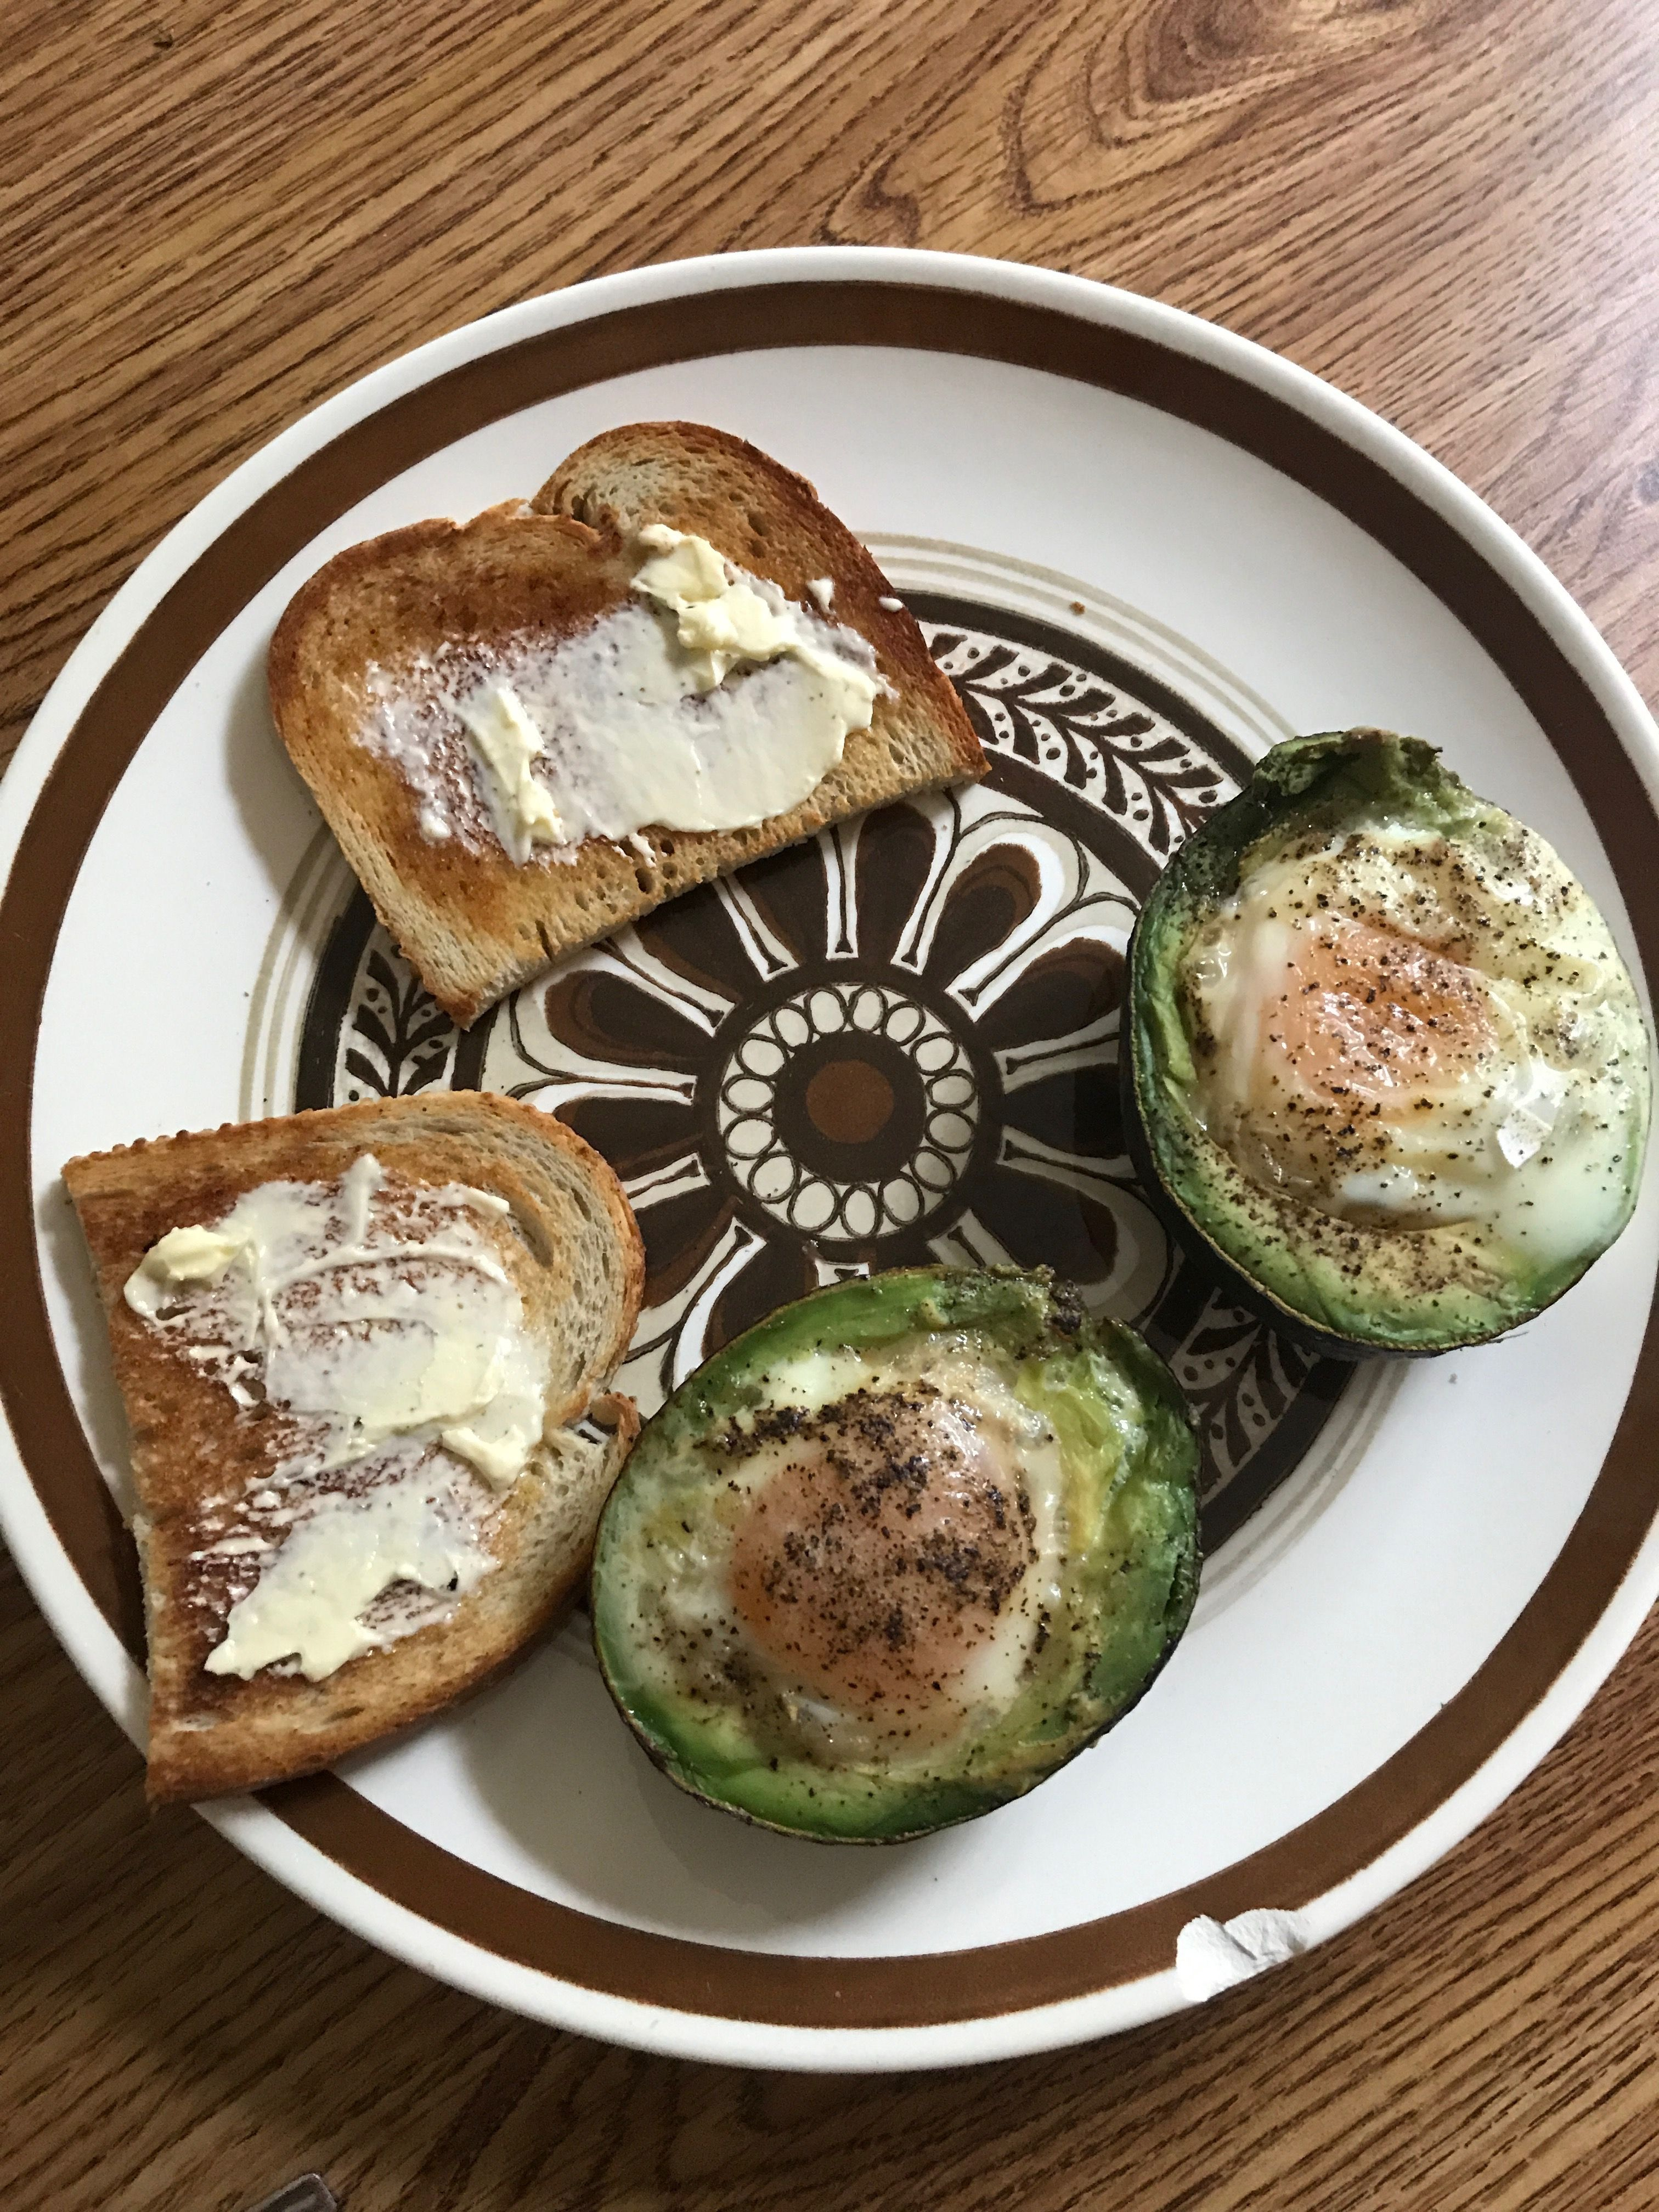 Avocado Eggs Baked